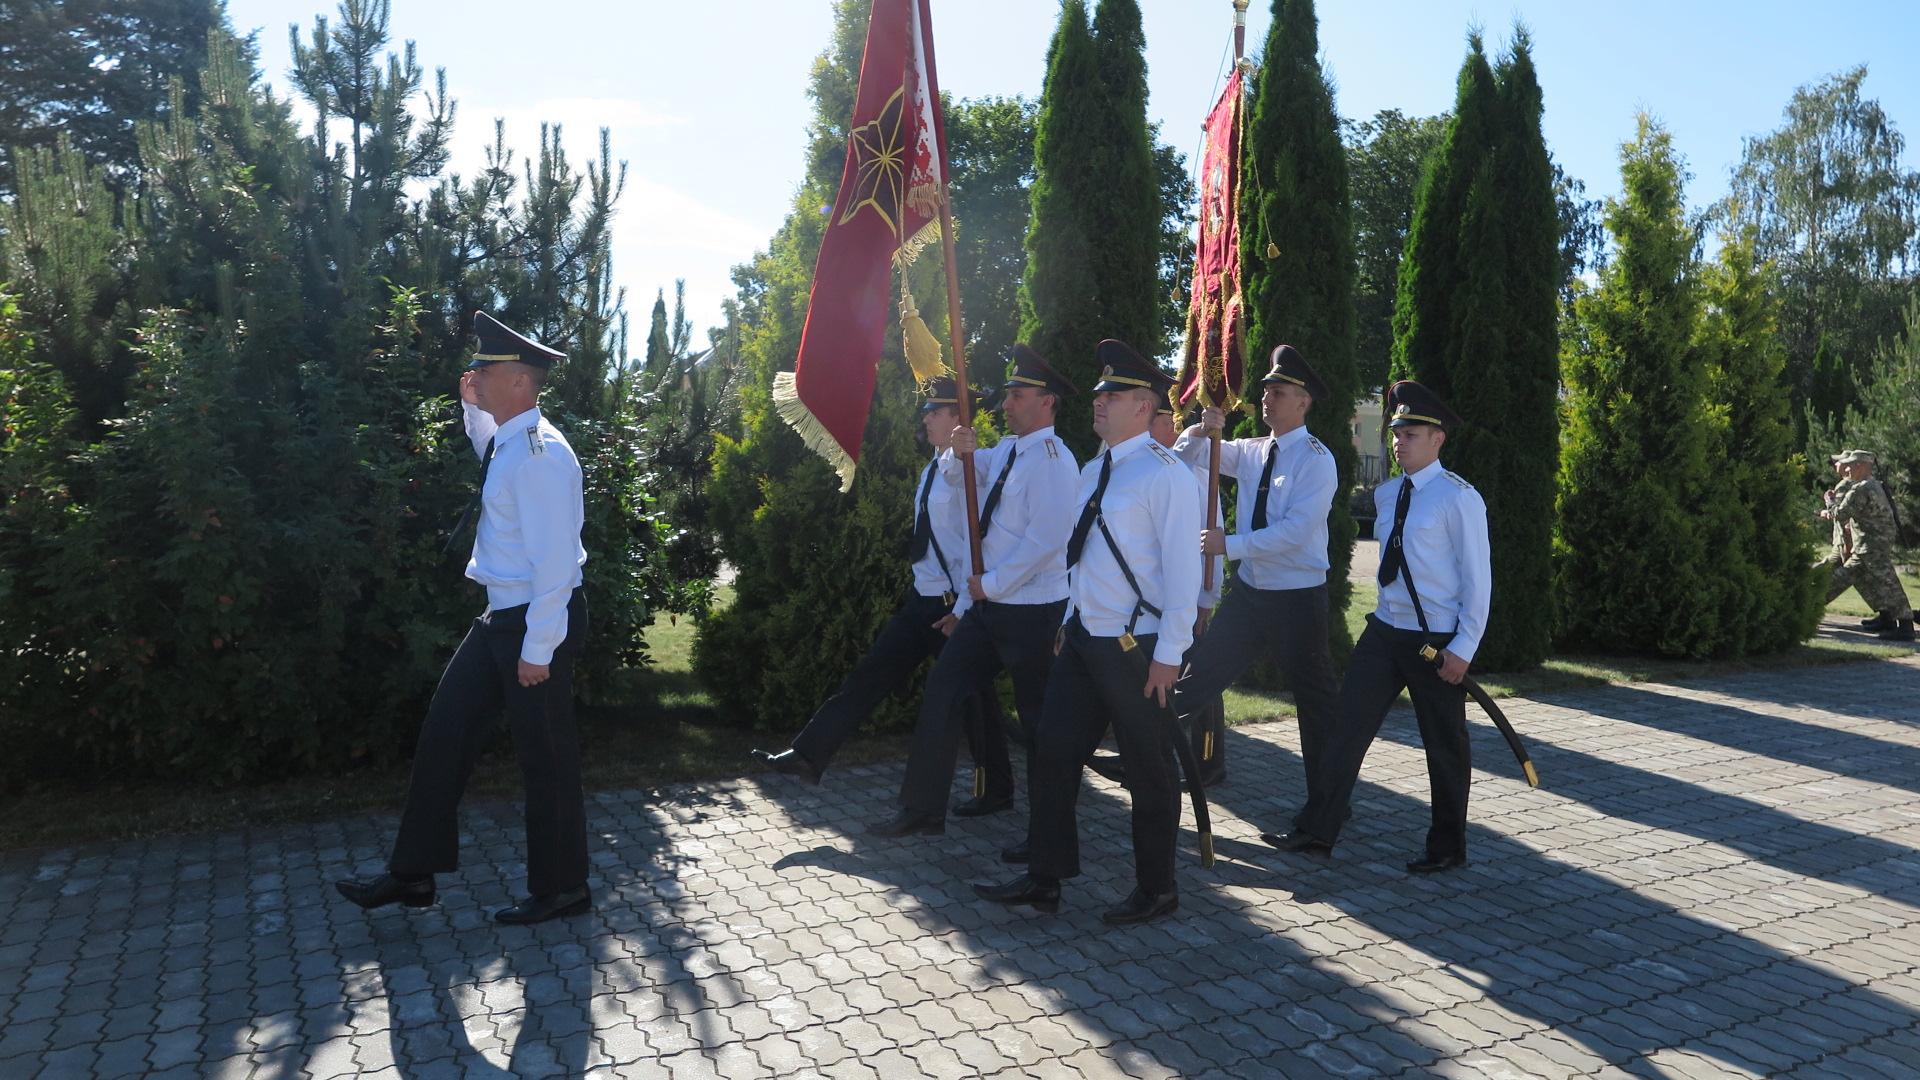 Вынос боевого знамени и хоругви бригады под звуки оркестра. Фото: Диана КОСЯКИНА